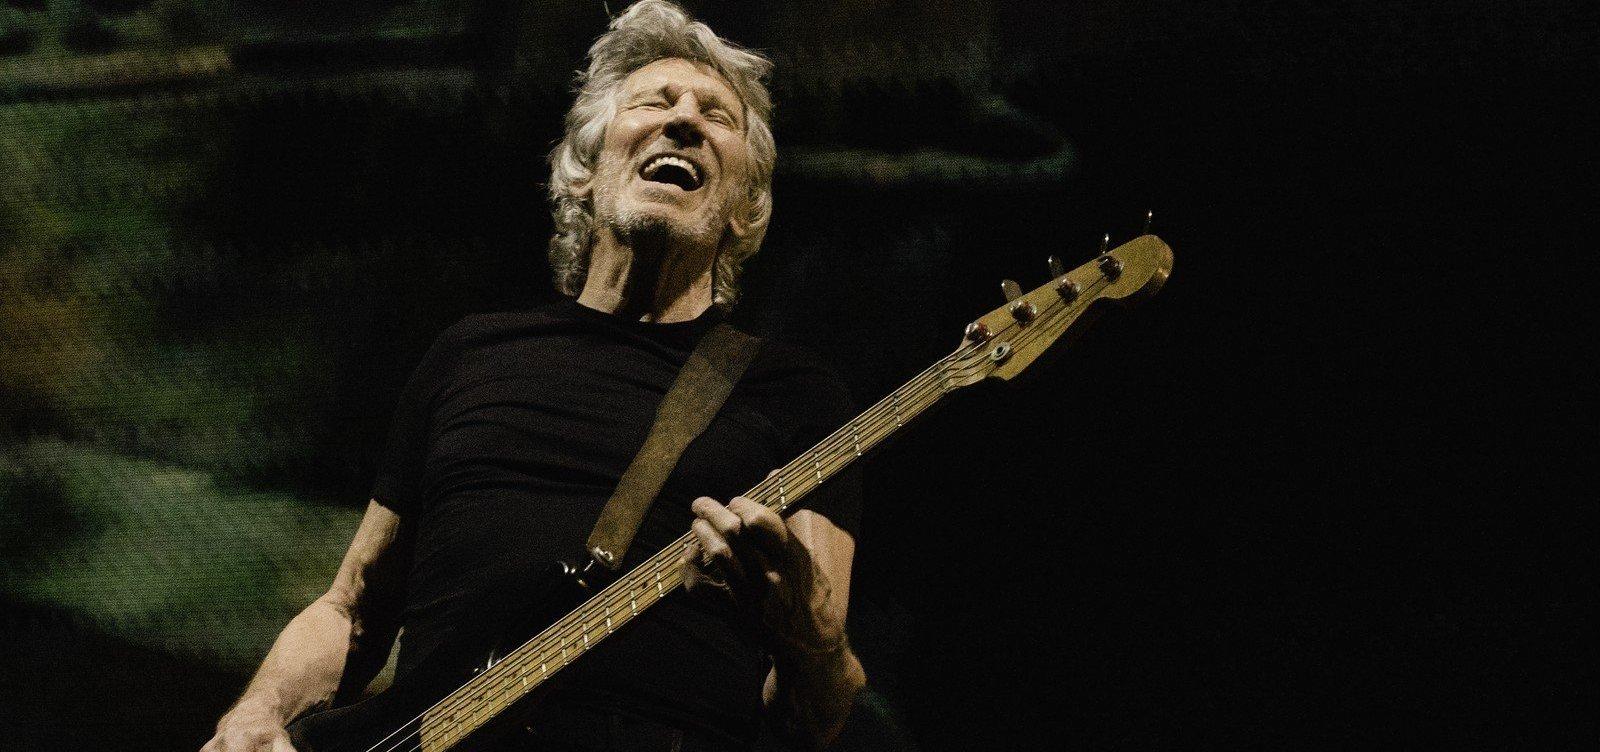 Roger Waters quer visitar Lula na prisão antes de deixar Brasil